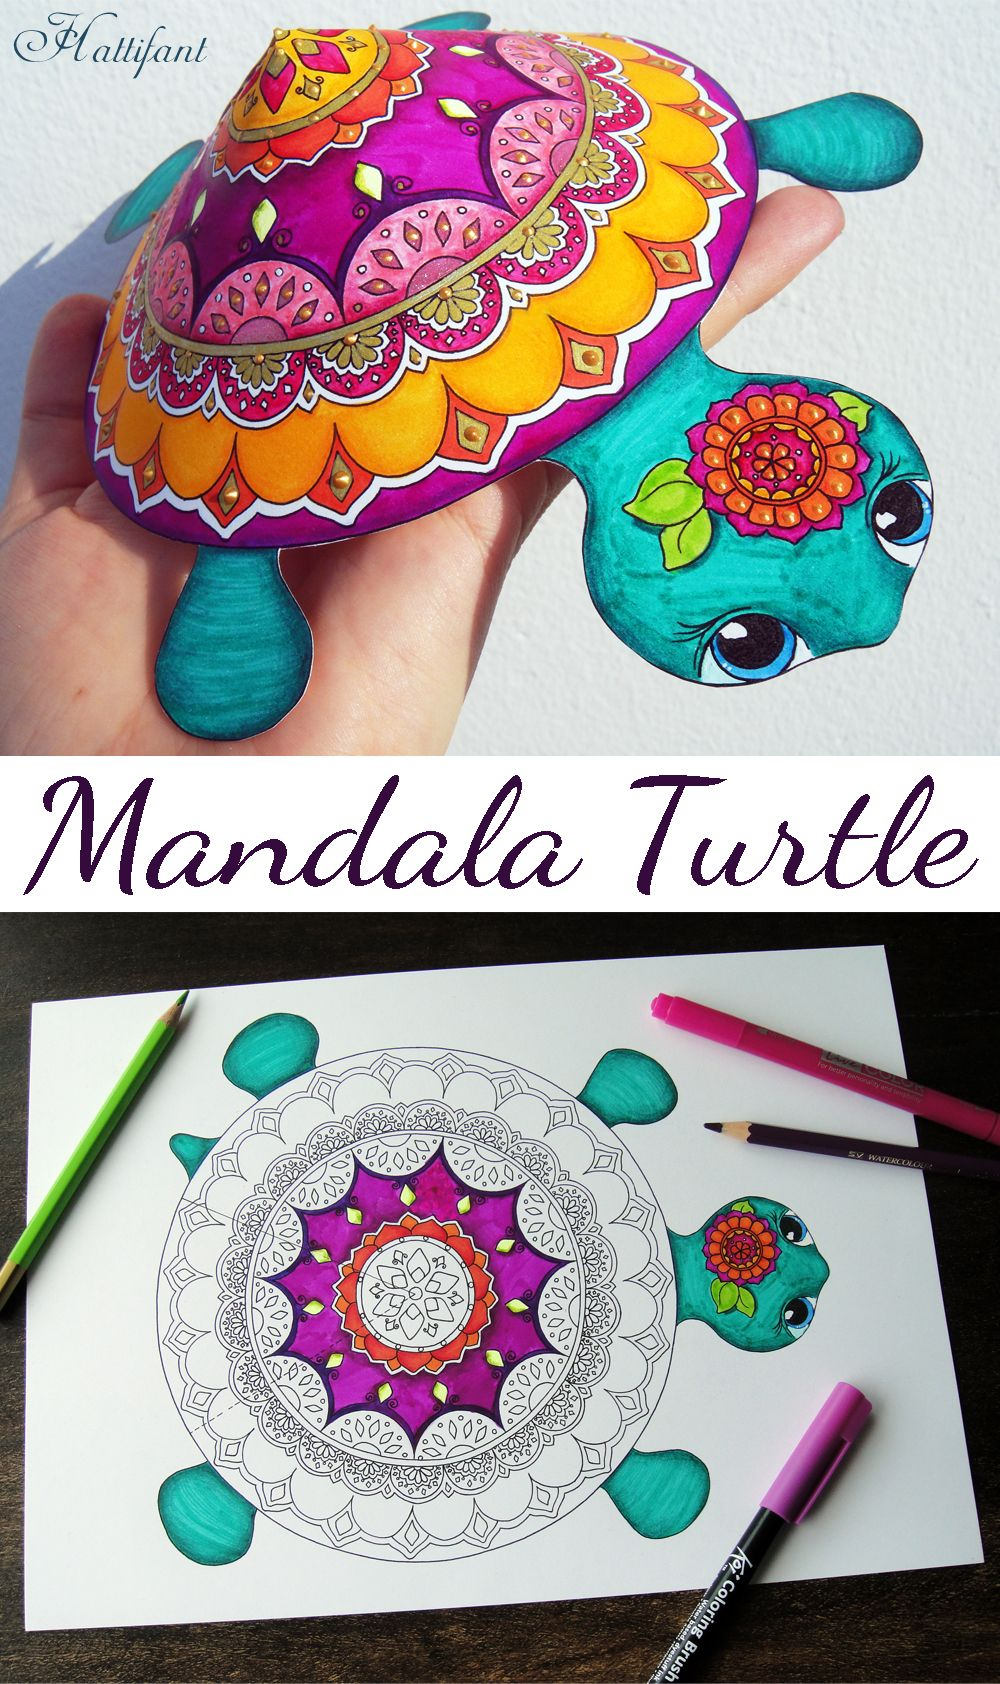 mandala turtle rare species coloring papercraft drawings turtle crafts mandala. Black Bedroom Furniture Sets. Home Design Ideas